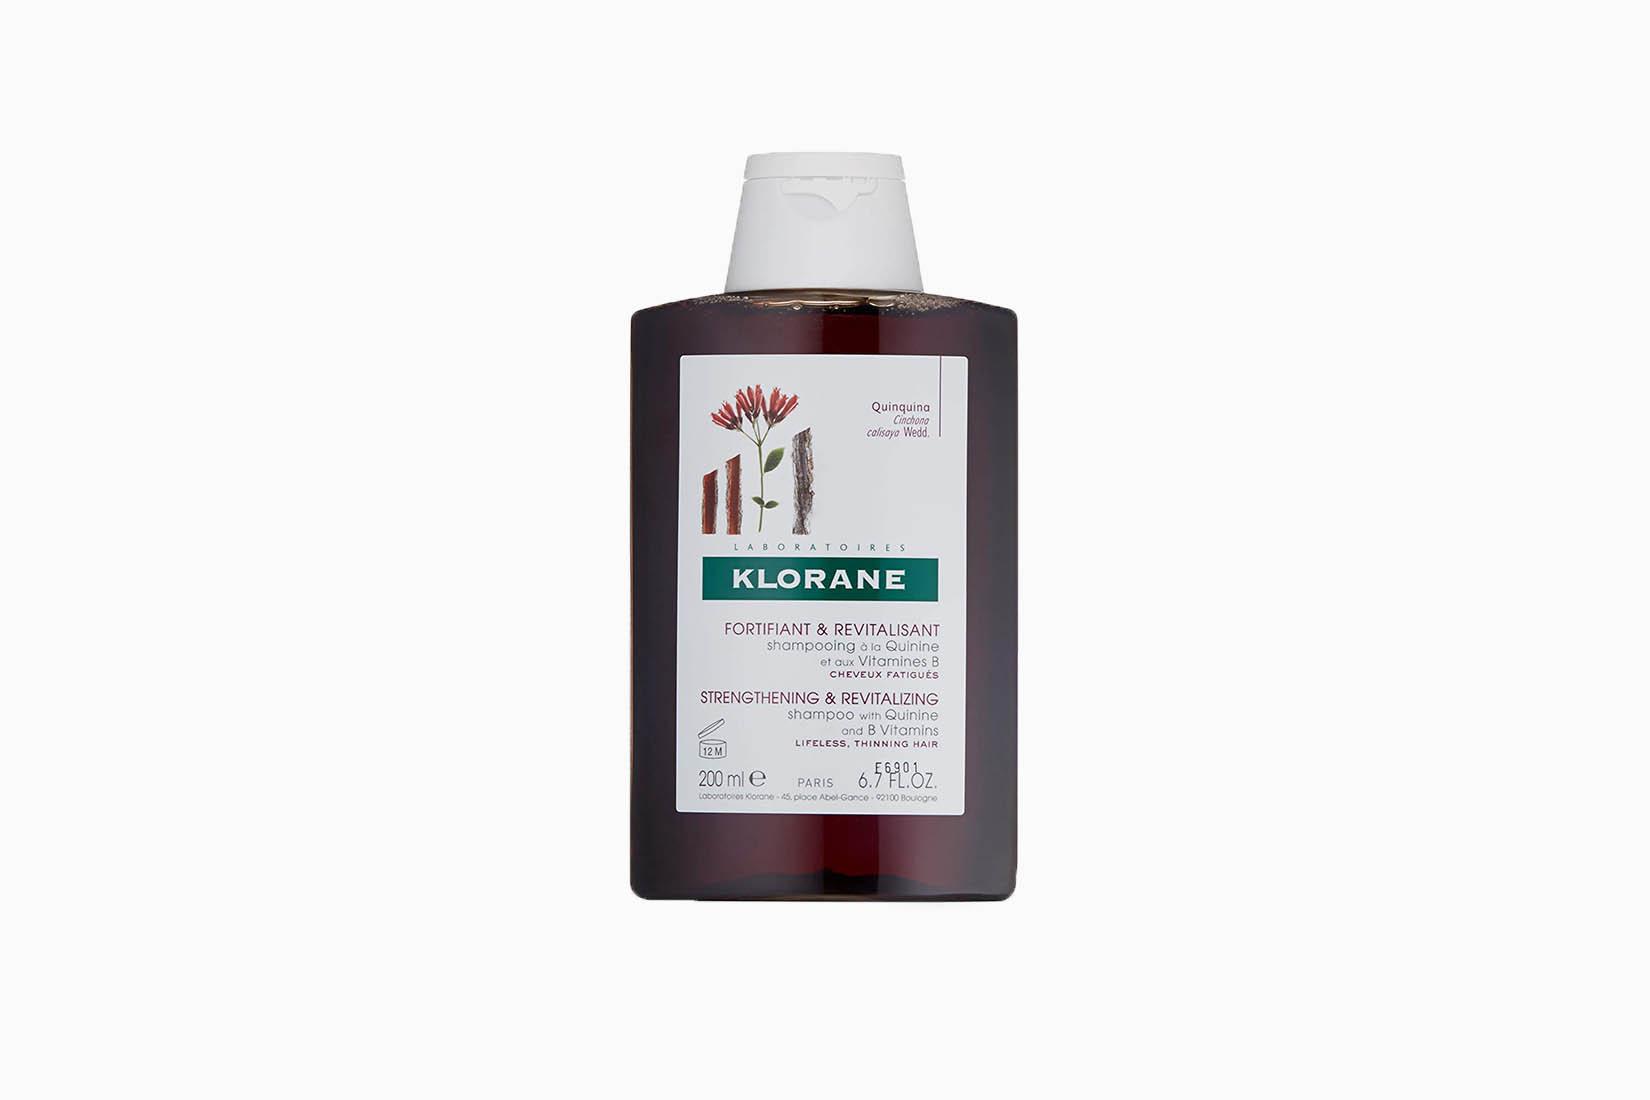 Best Hair Pura Dor Shampoo Men Klorane Review - Luxe Digital